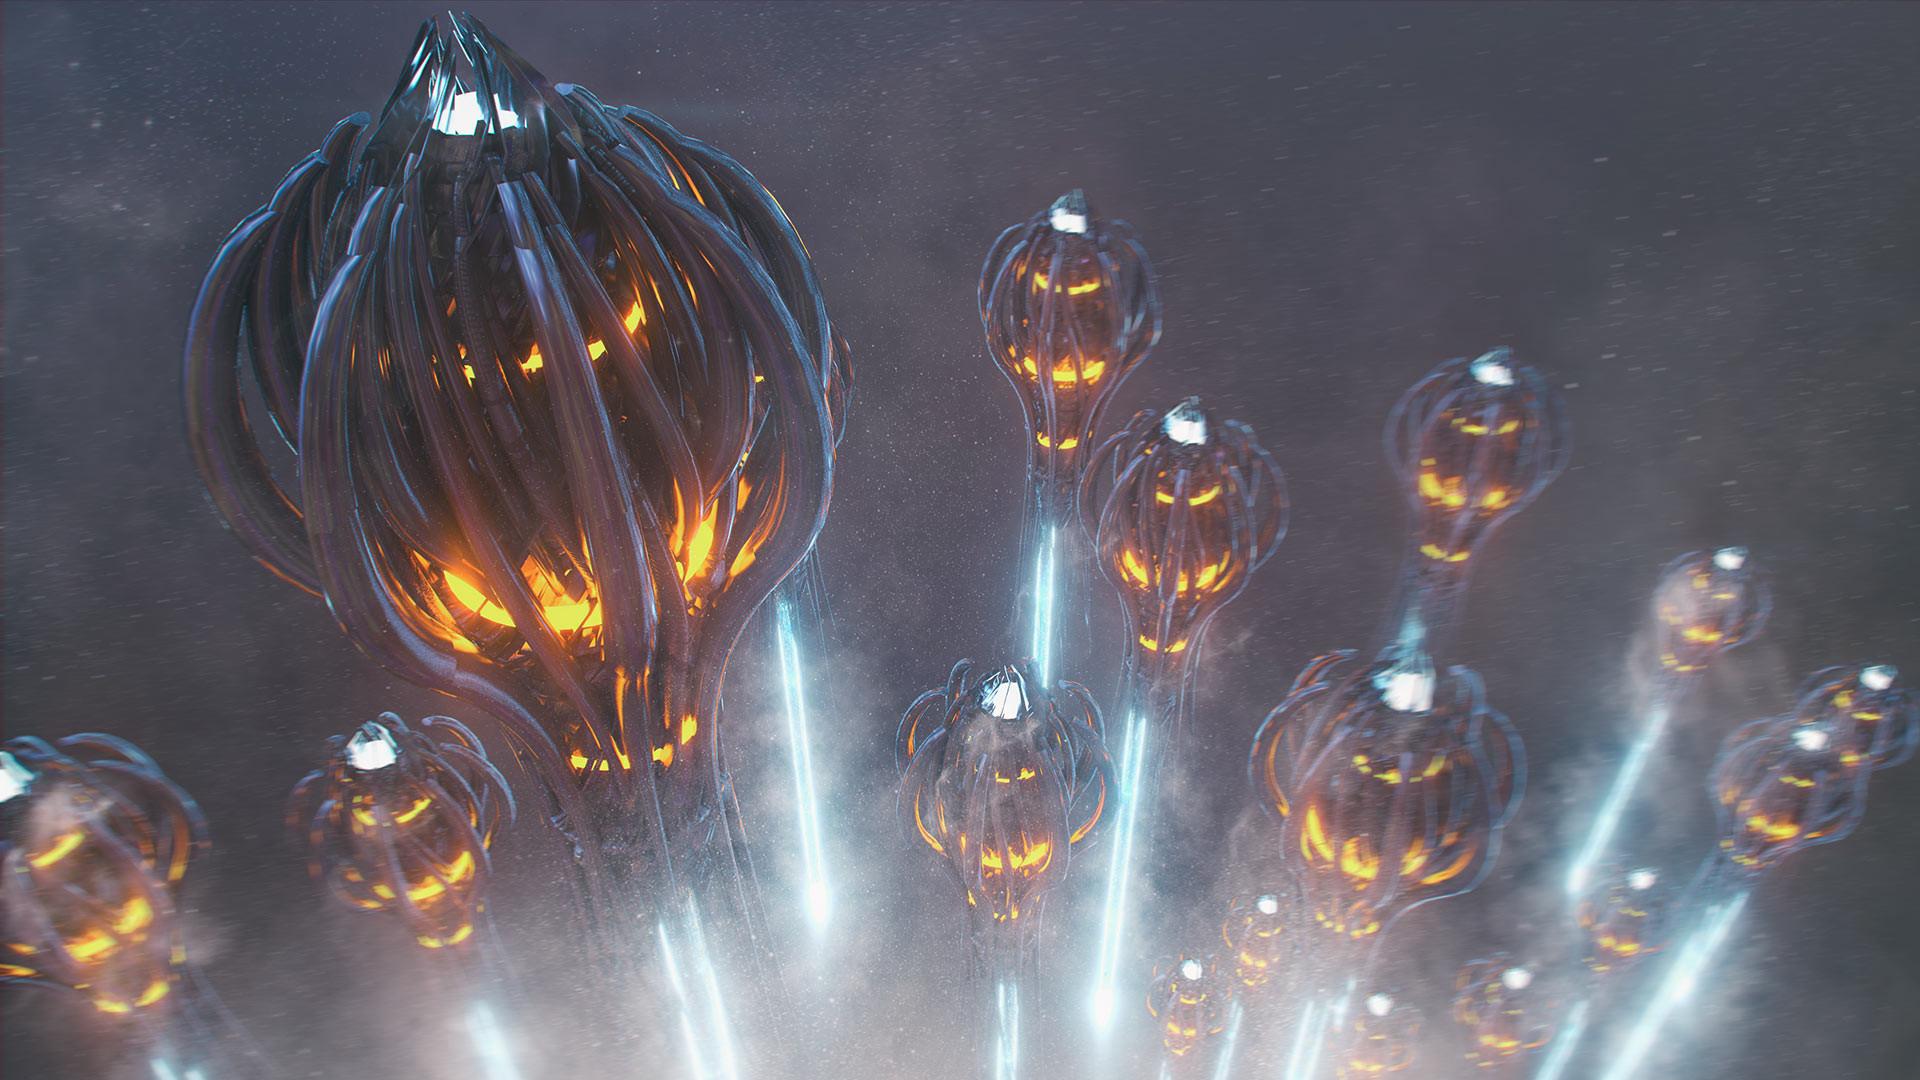 Kresimir jelusic robob3ar 242 110616 swarm2